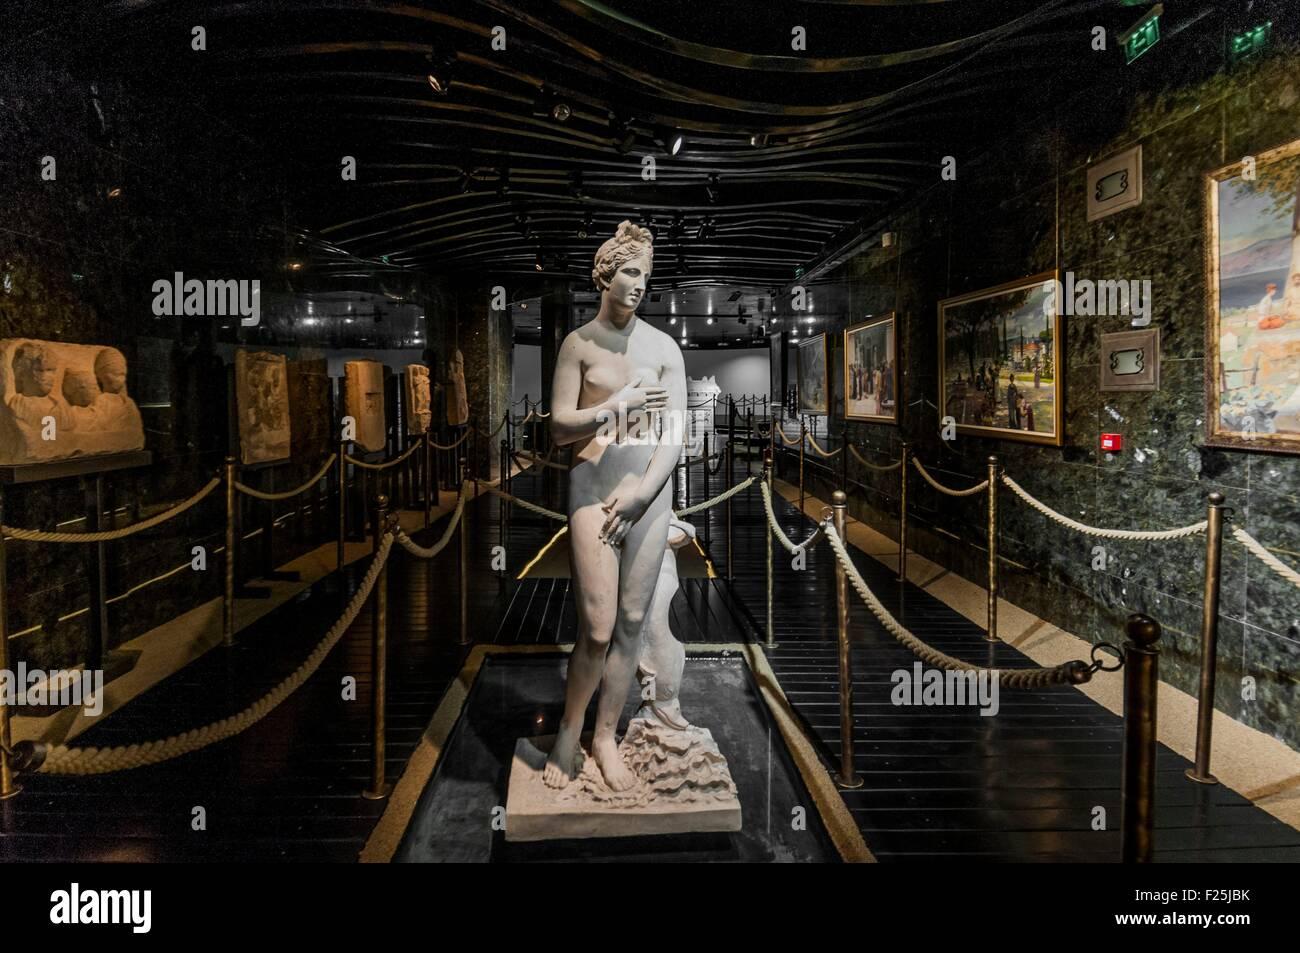 Macedonia, Skopje, new Archeologic Museum of Macedoinia, floor dedicated at the antiquity, Venus statue - Stock Image